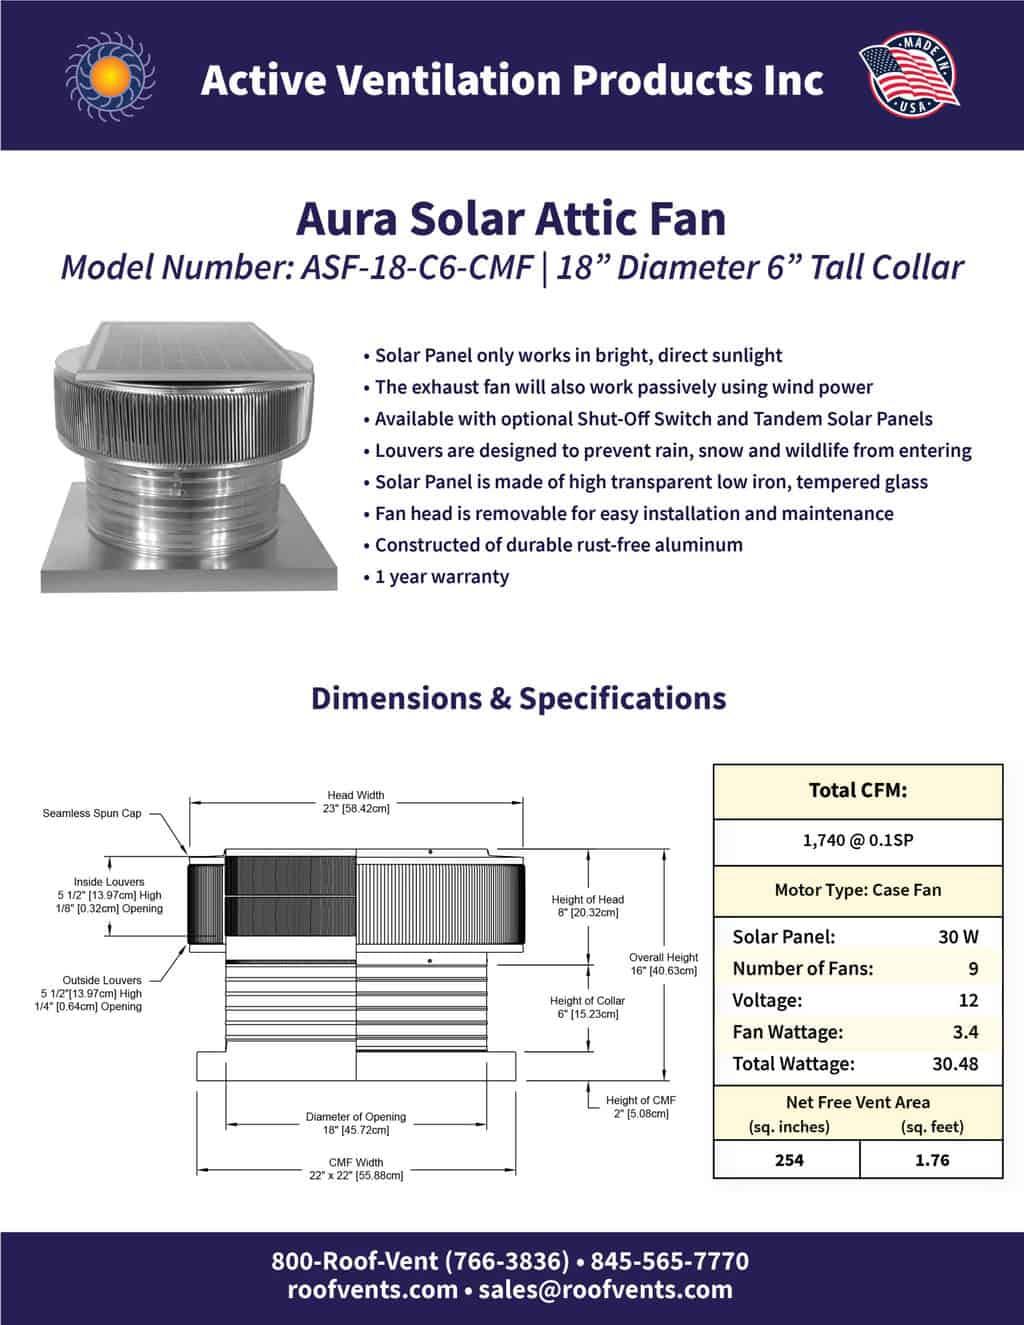 ASF-18-C6-CMF-brochure